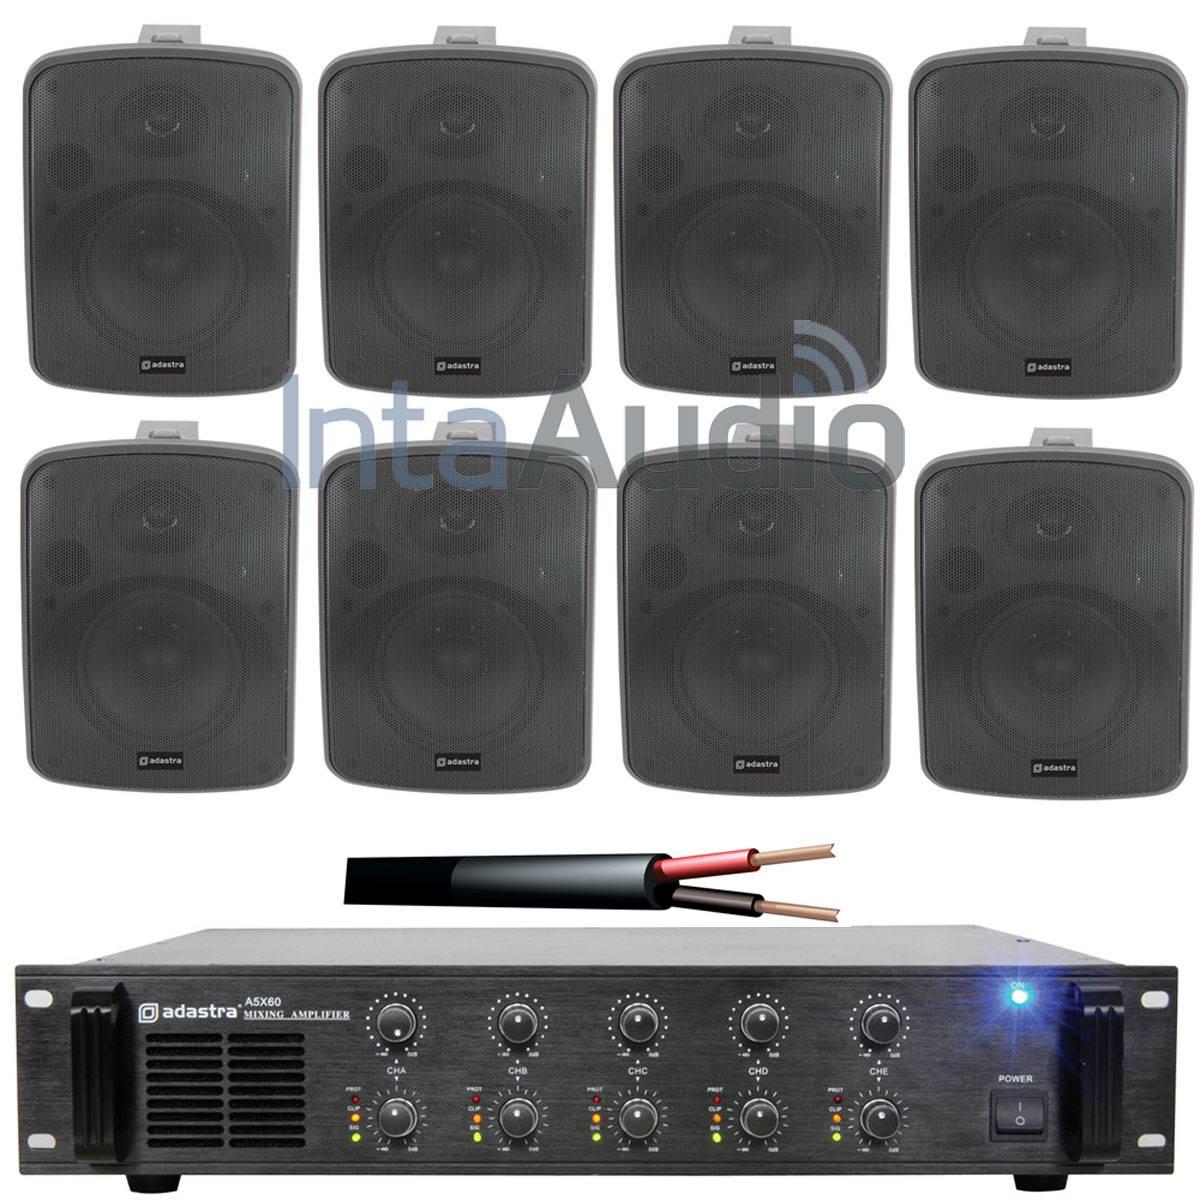 Adastra 8 Speaker Restaurant Compact Background Music